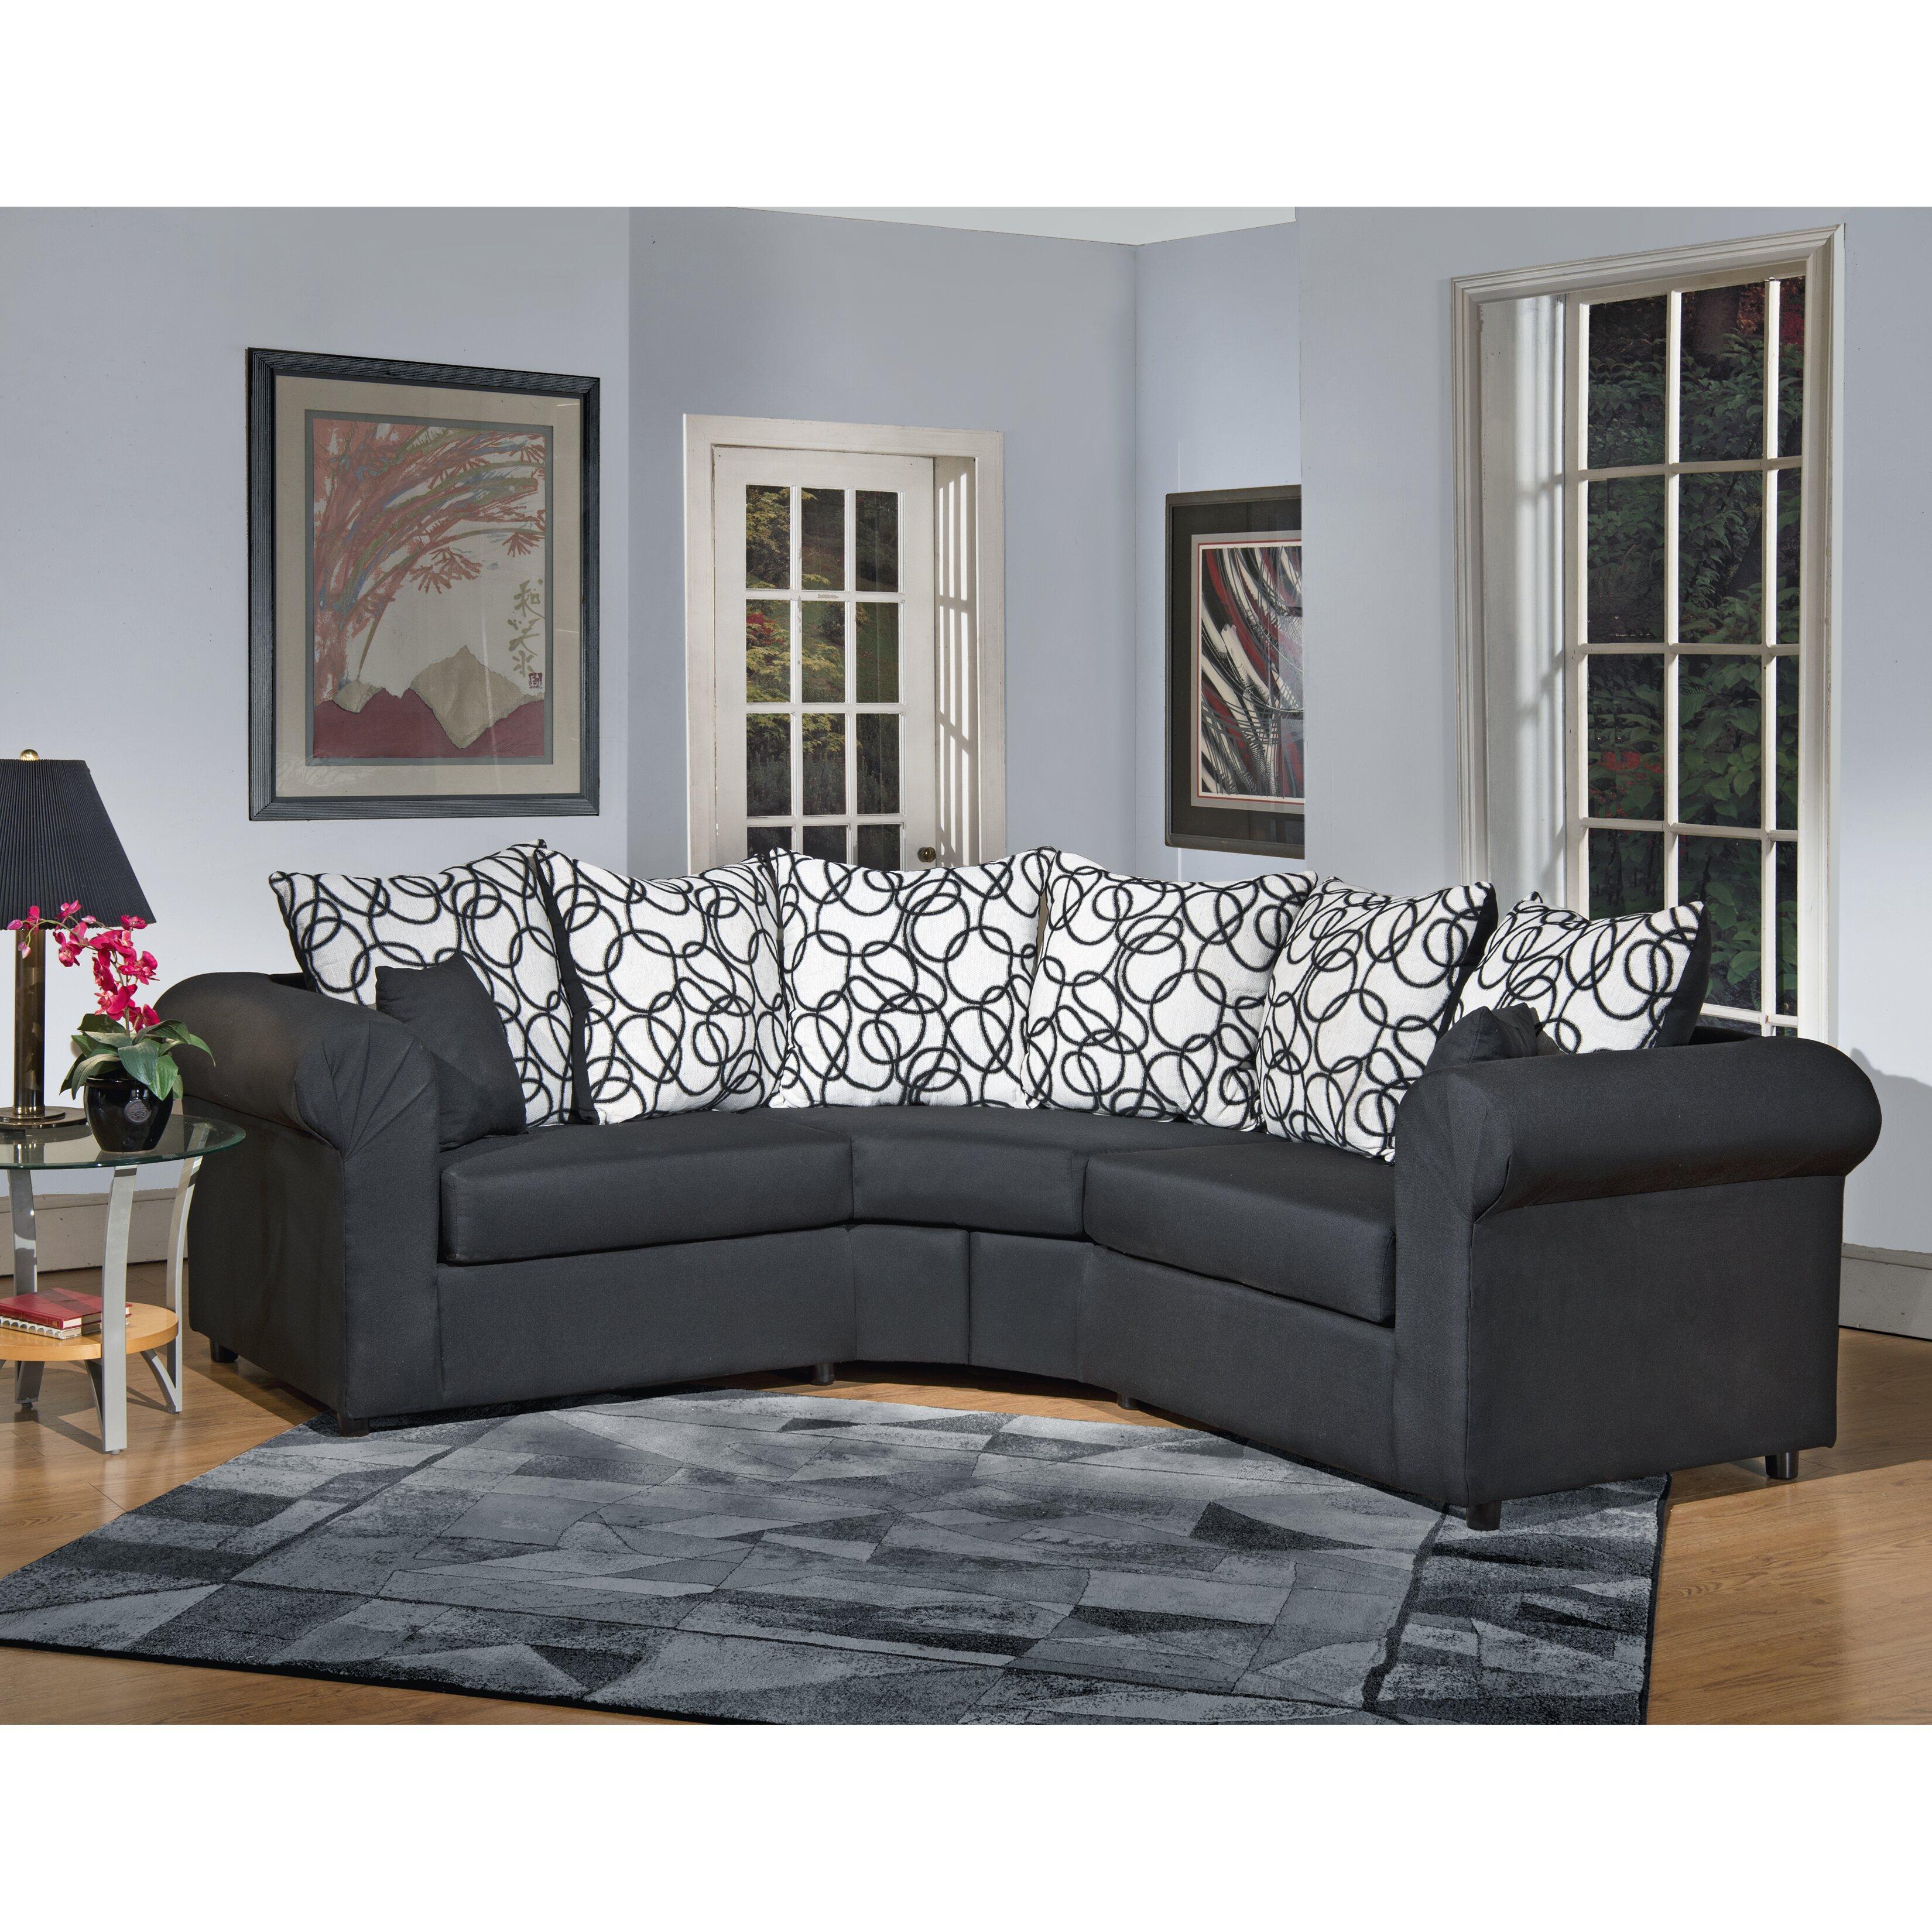 latitude run lila sectional reviews. Black Bedroom Furniture Sets. Home Design Ideas